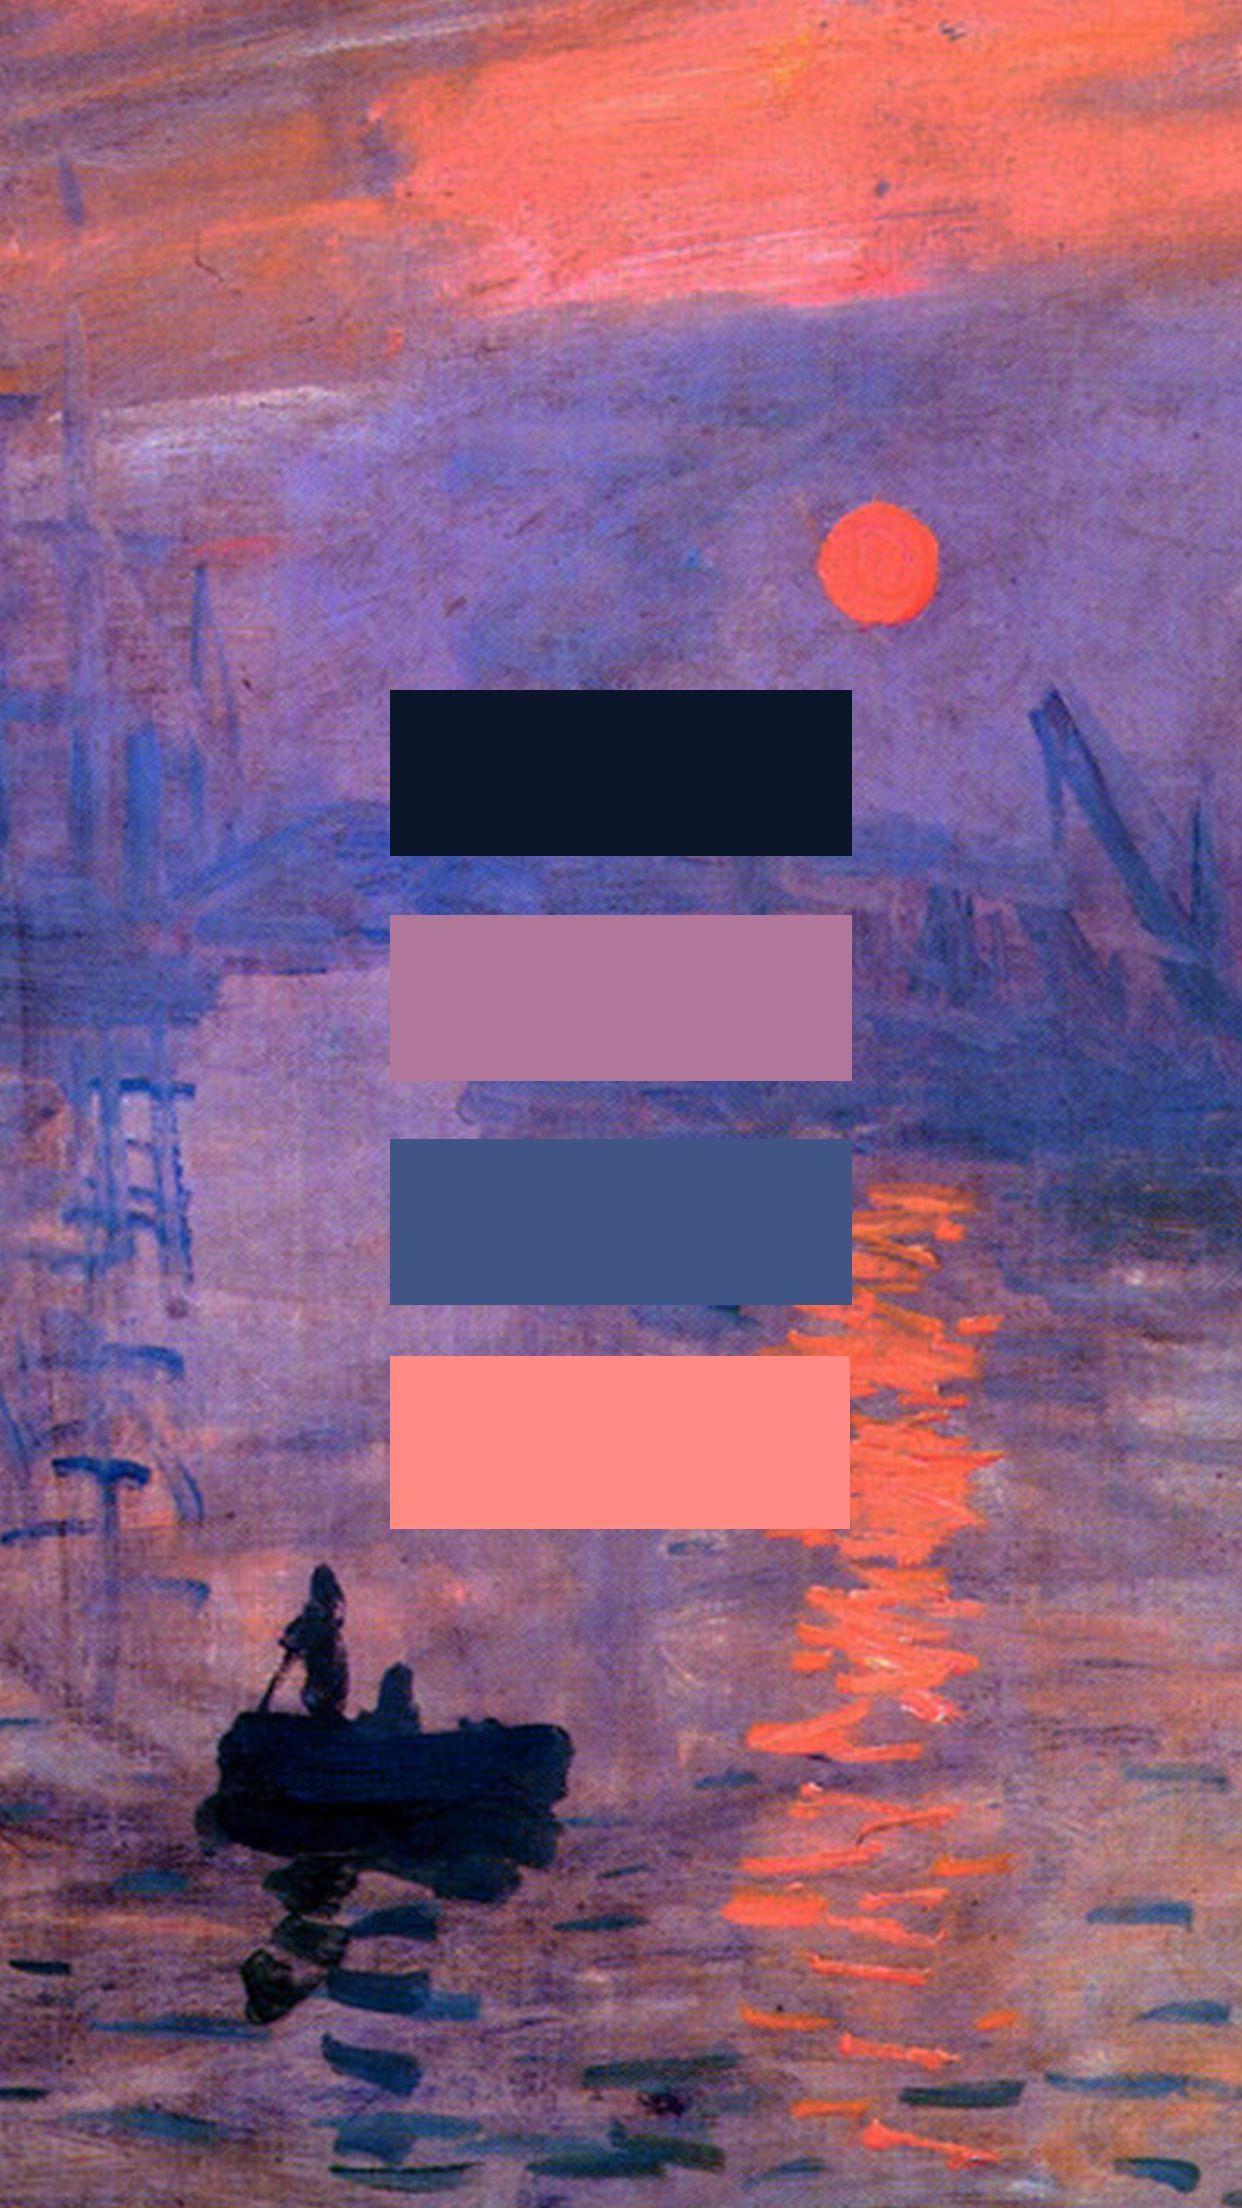 Artsy Aesthetic Wallpaper : artsy, aesthetic, wallpaper, Aesthetic, Wallpapers, Backgrounds, WallpaperAccess